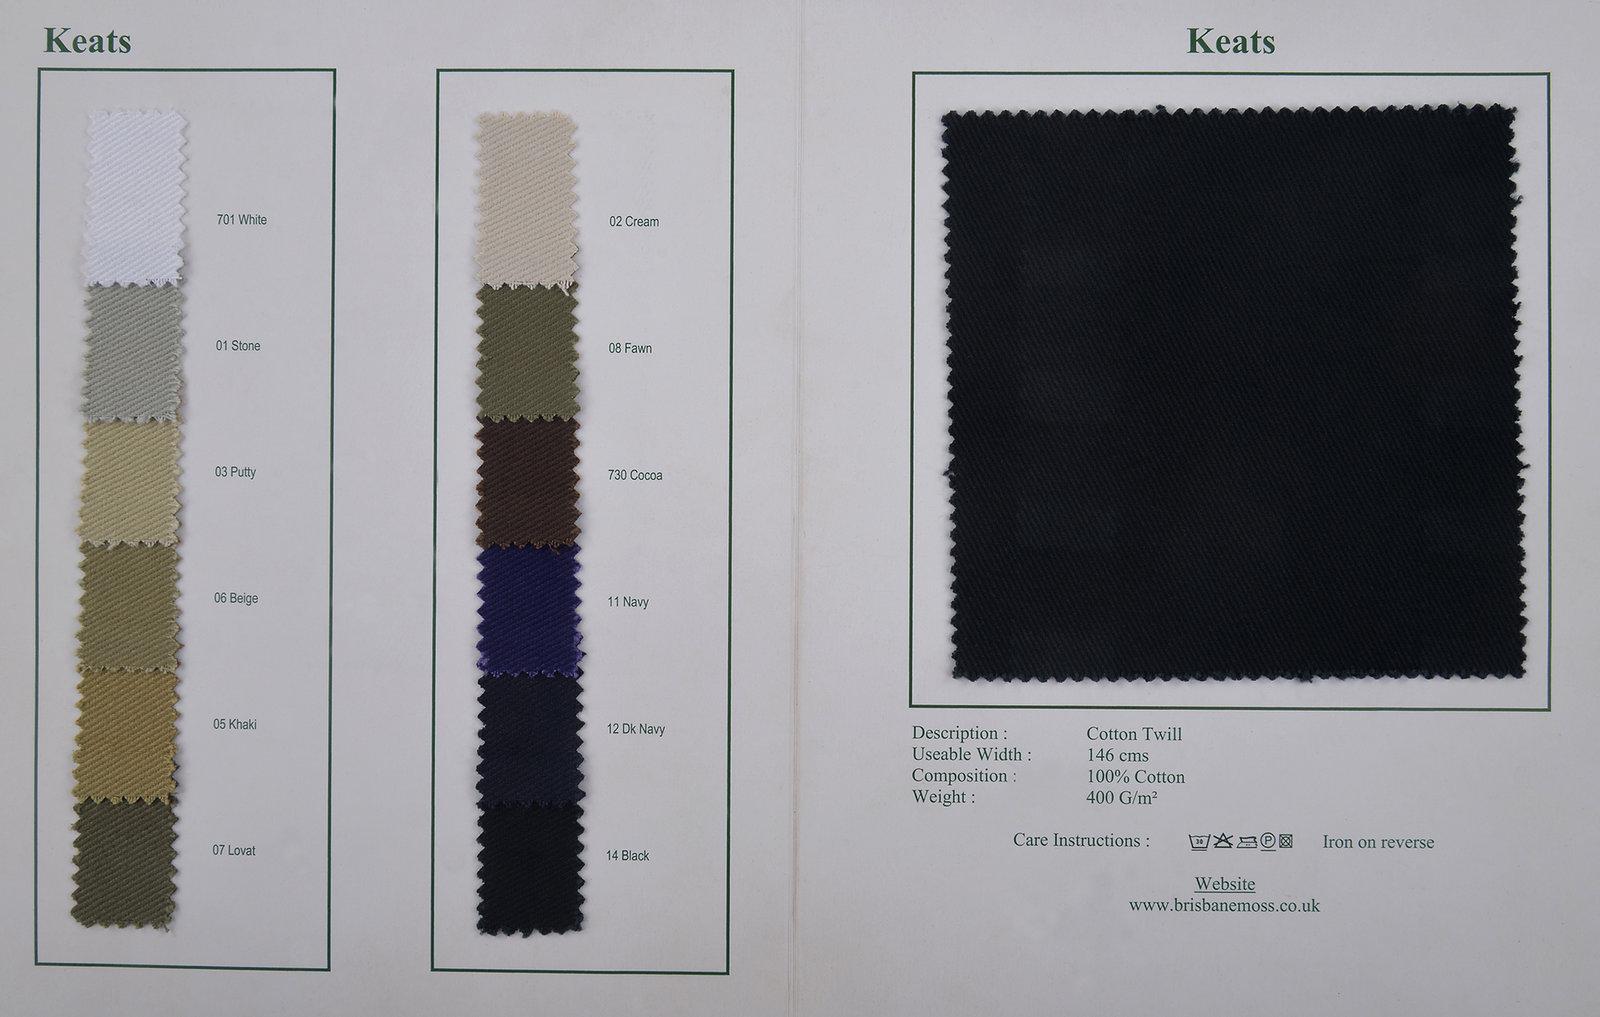 Keats_1.jpg